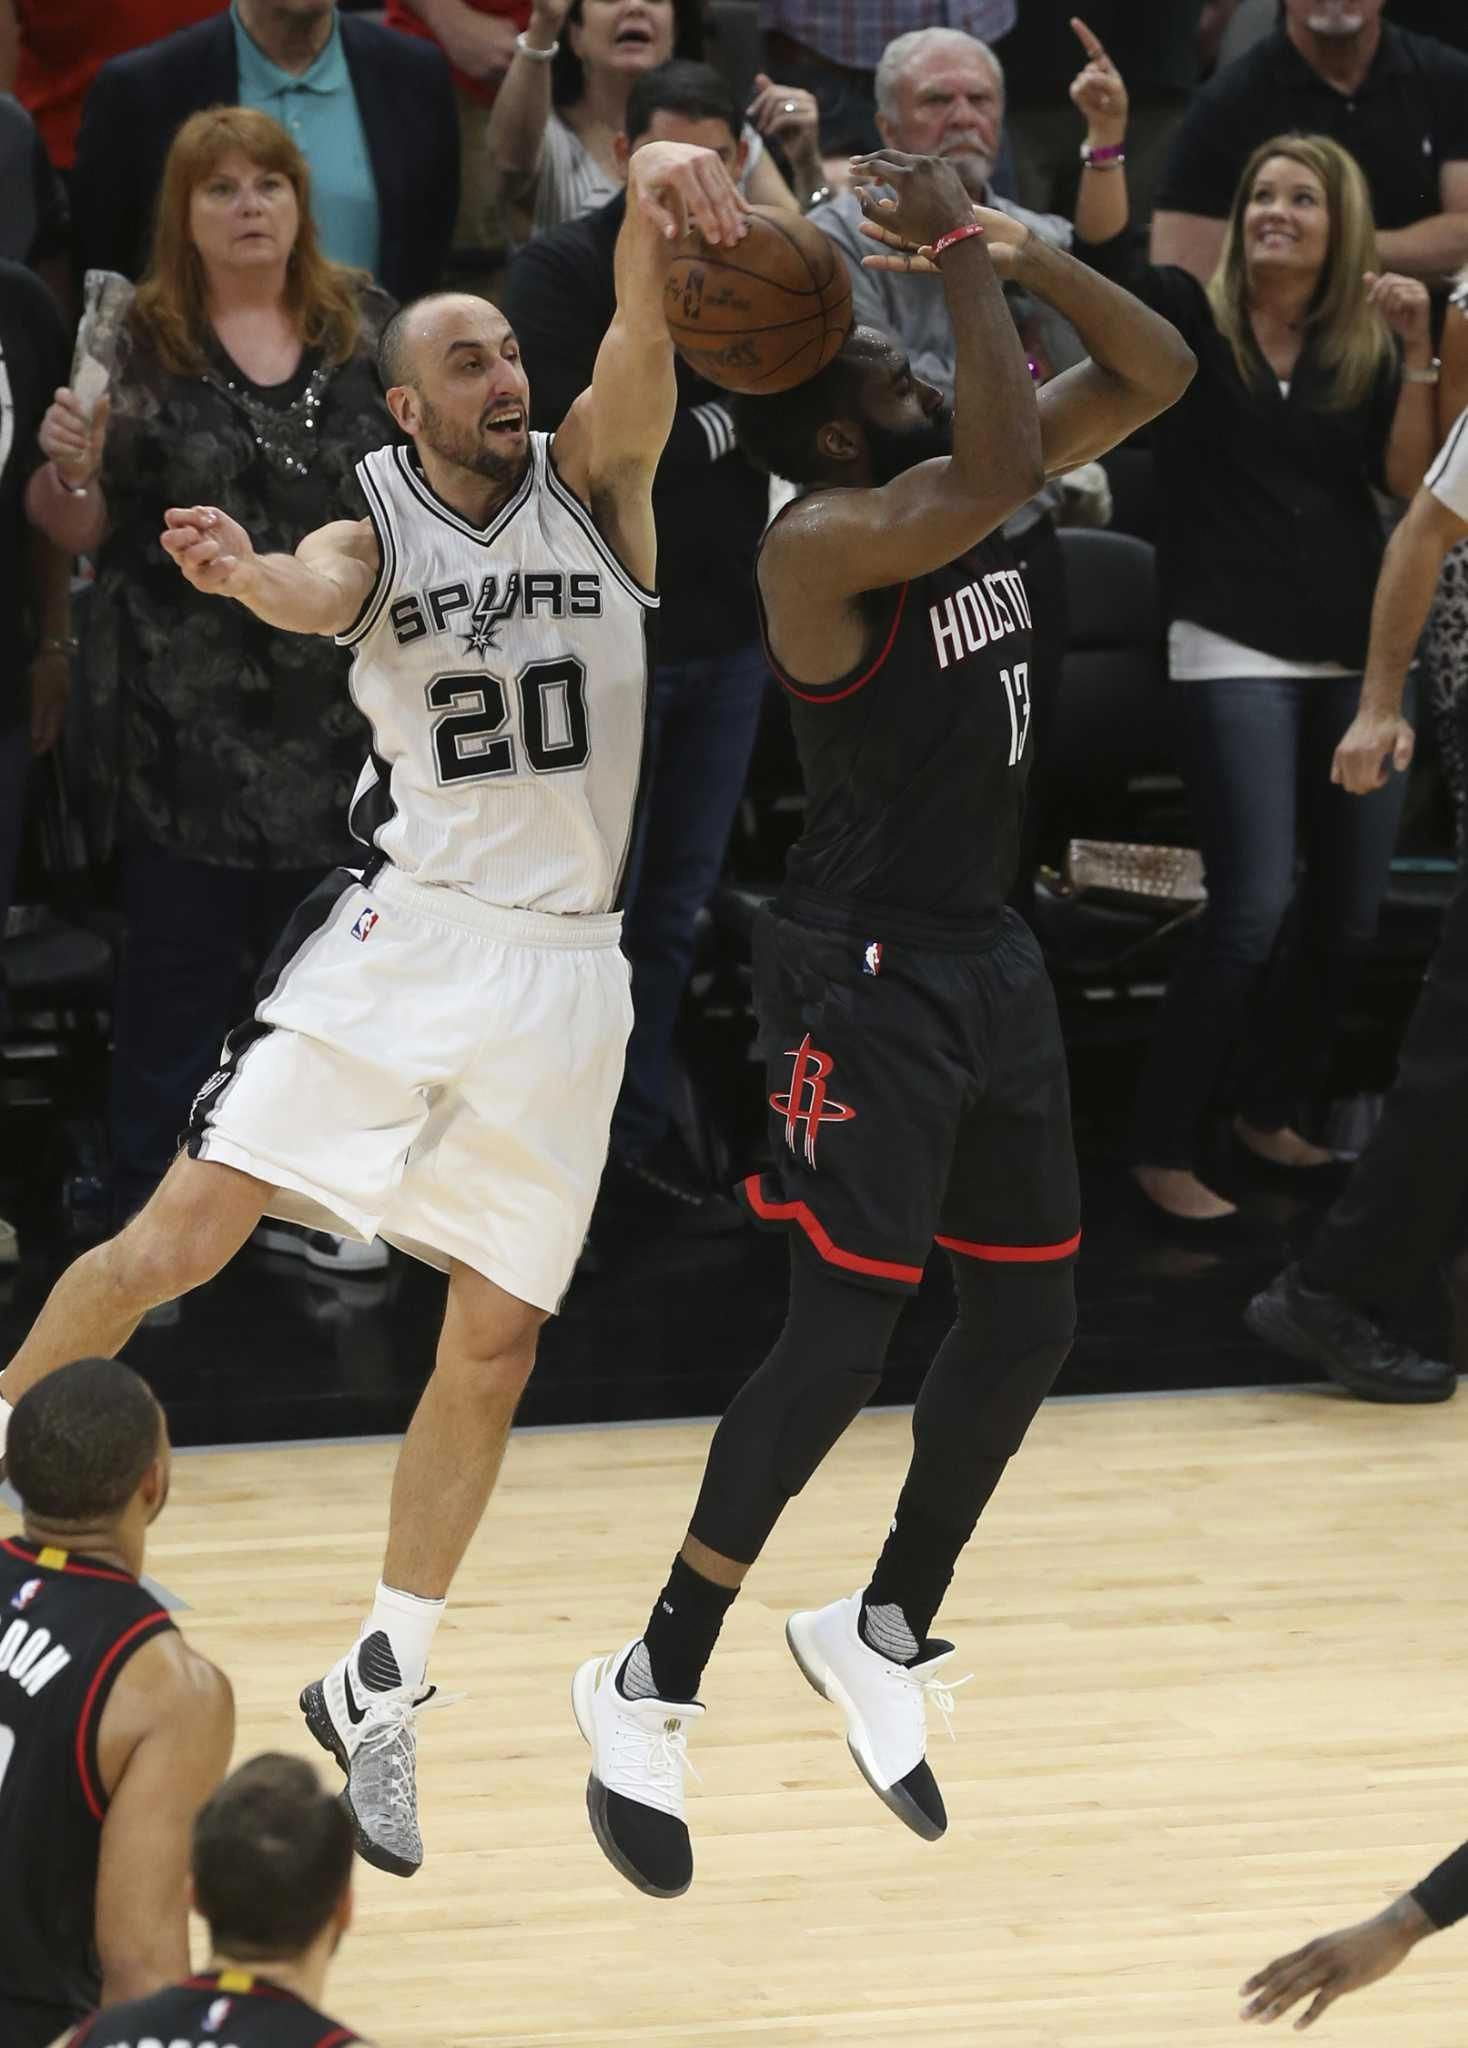 Basketball On Tonight Basketballfortonight Manu Ginobili Spurs Basketball Spurs